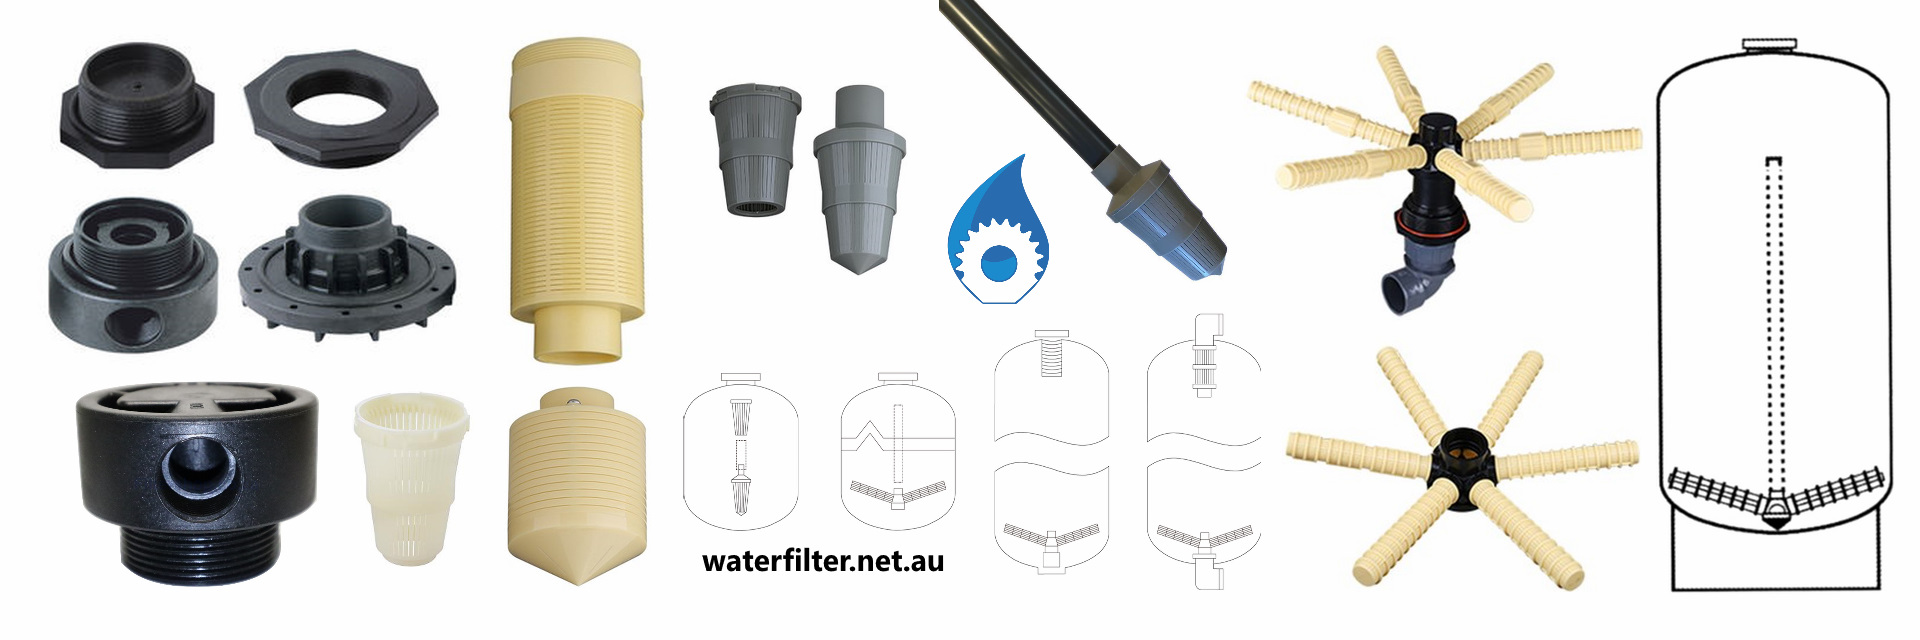 Media Filtration Tank Accessories & Components Australia